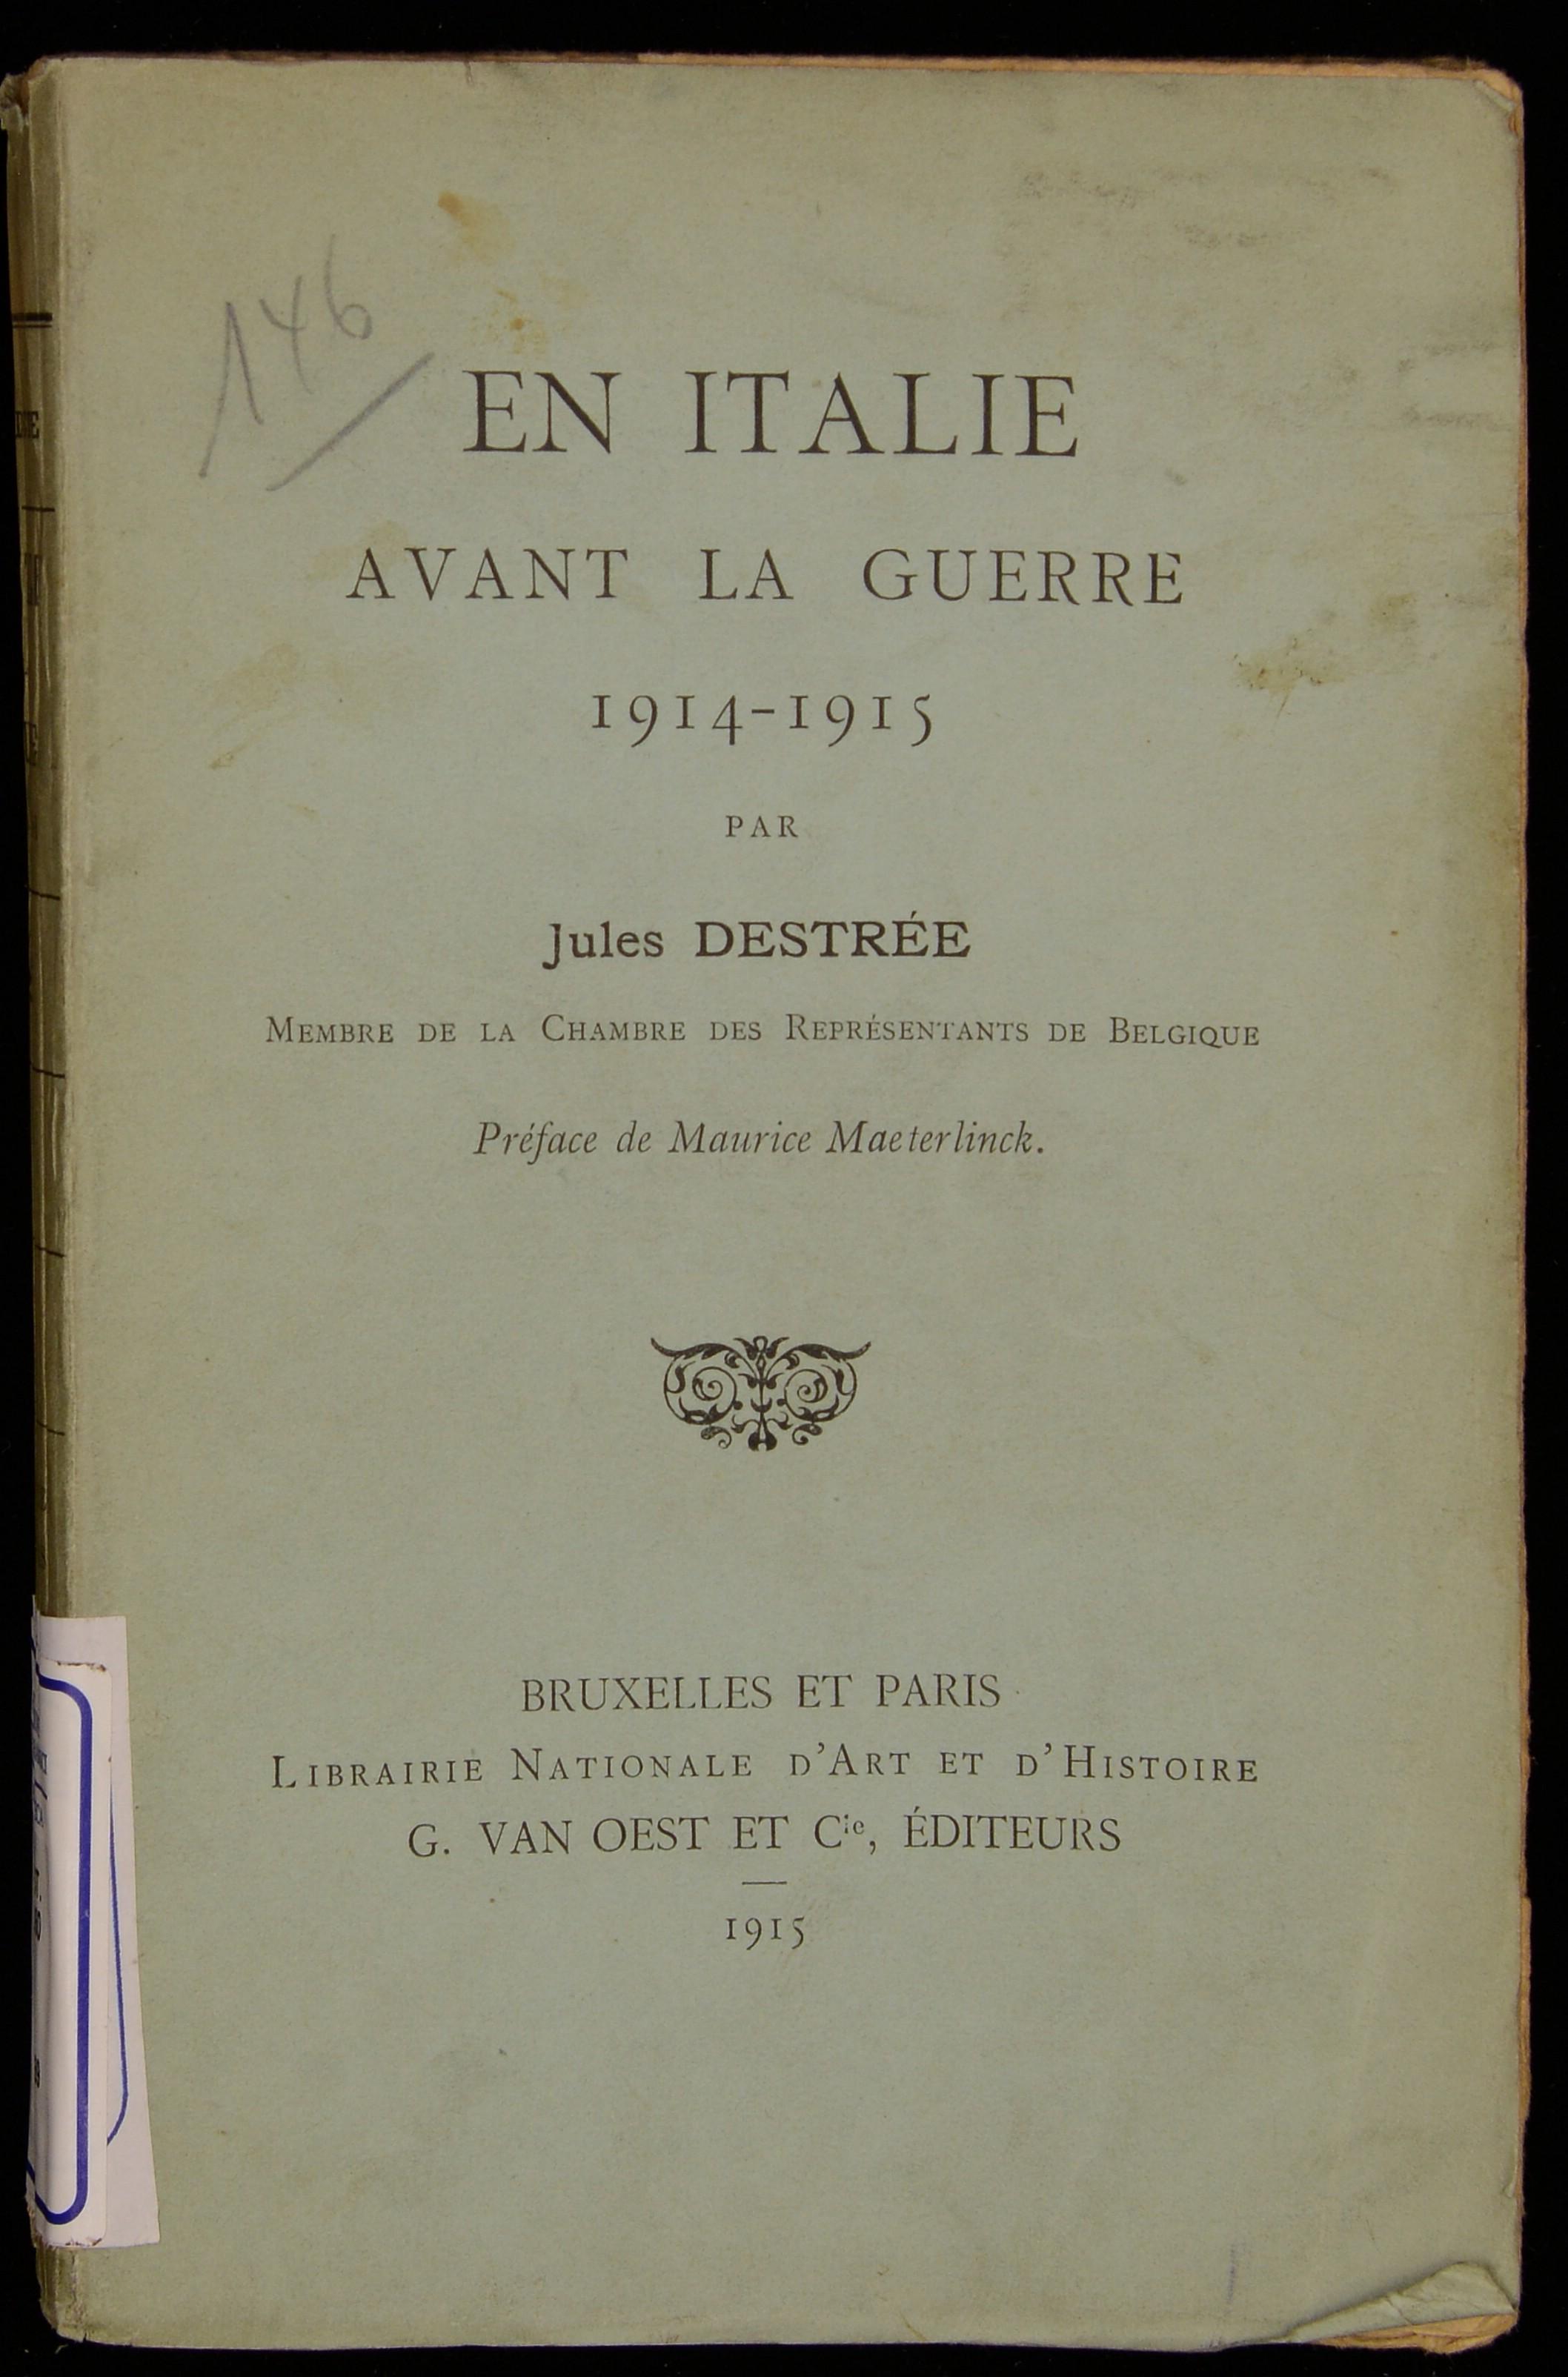 En Italie avant la guerre 1914-1915